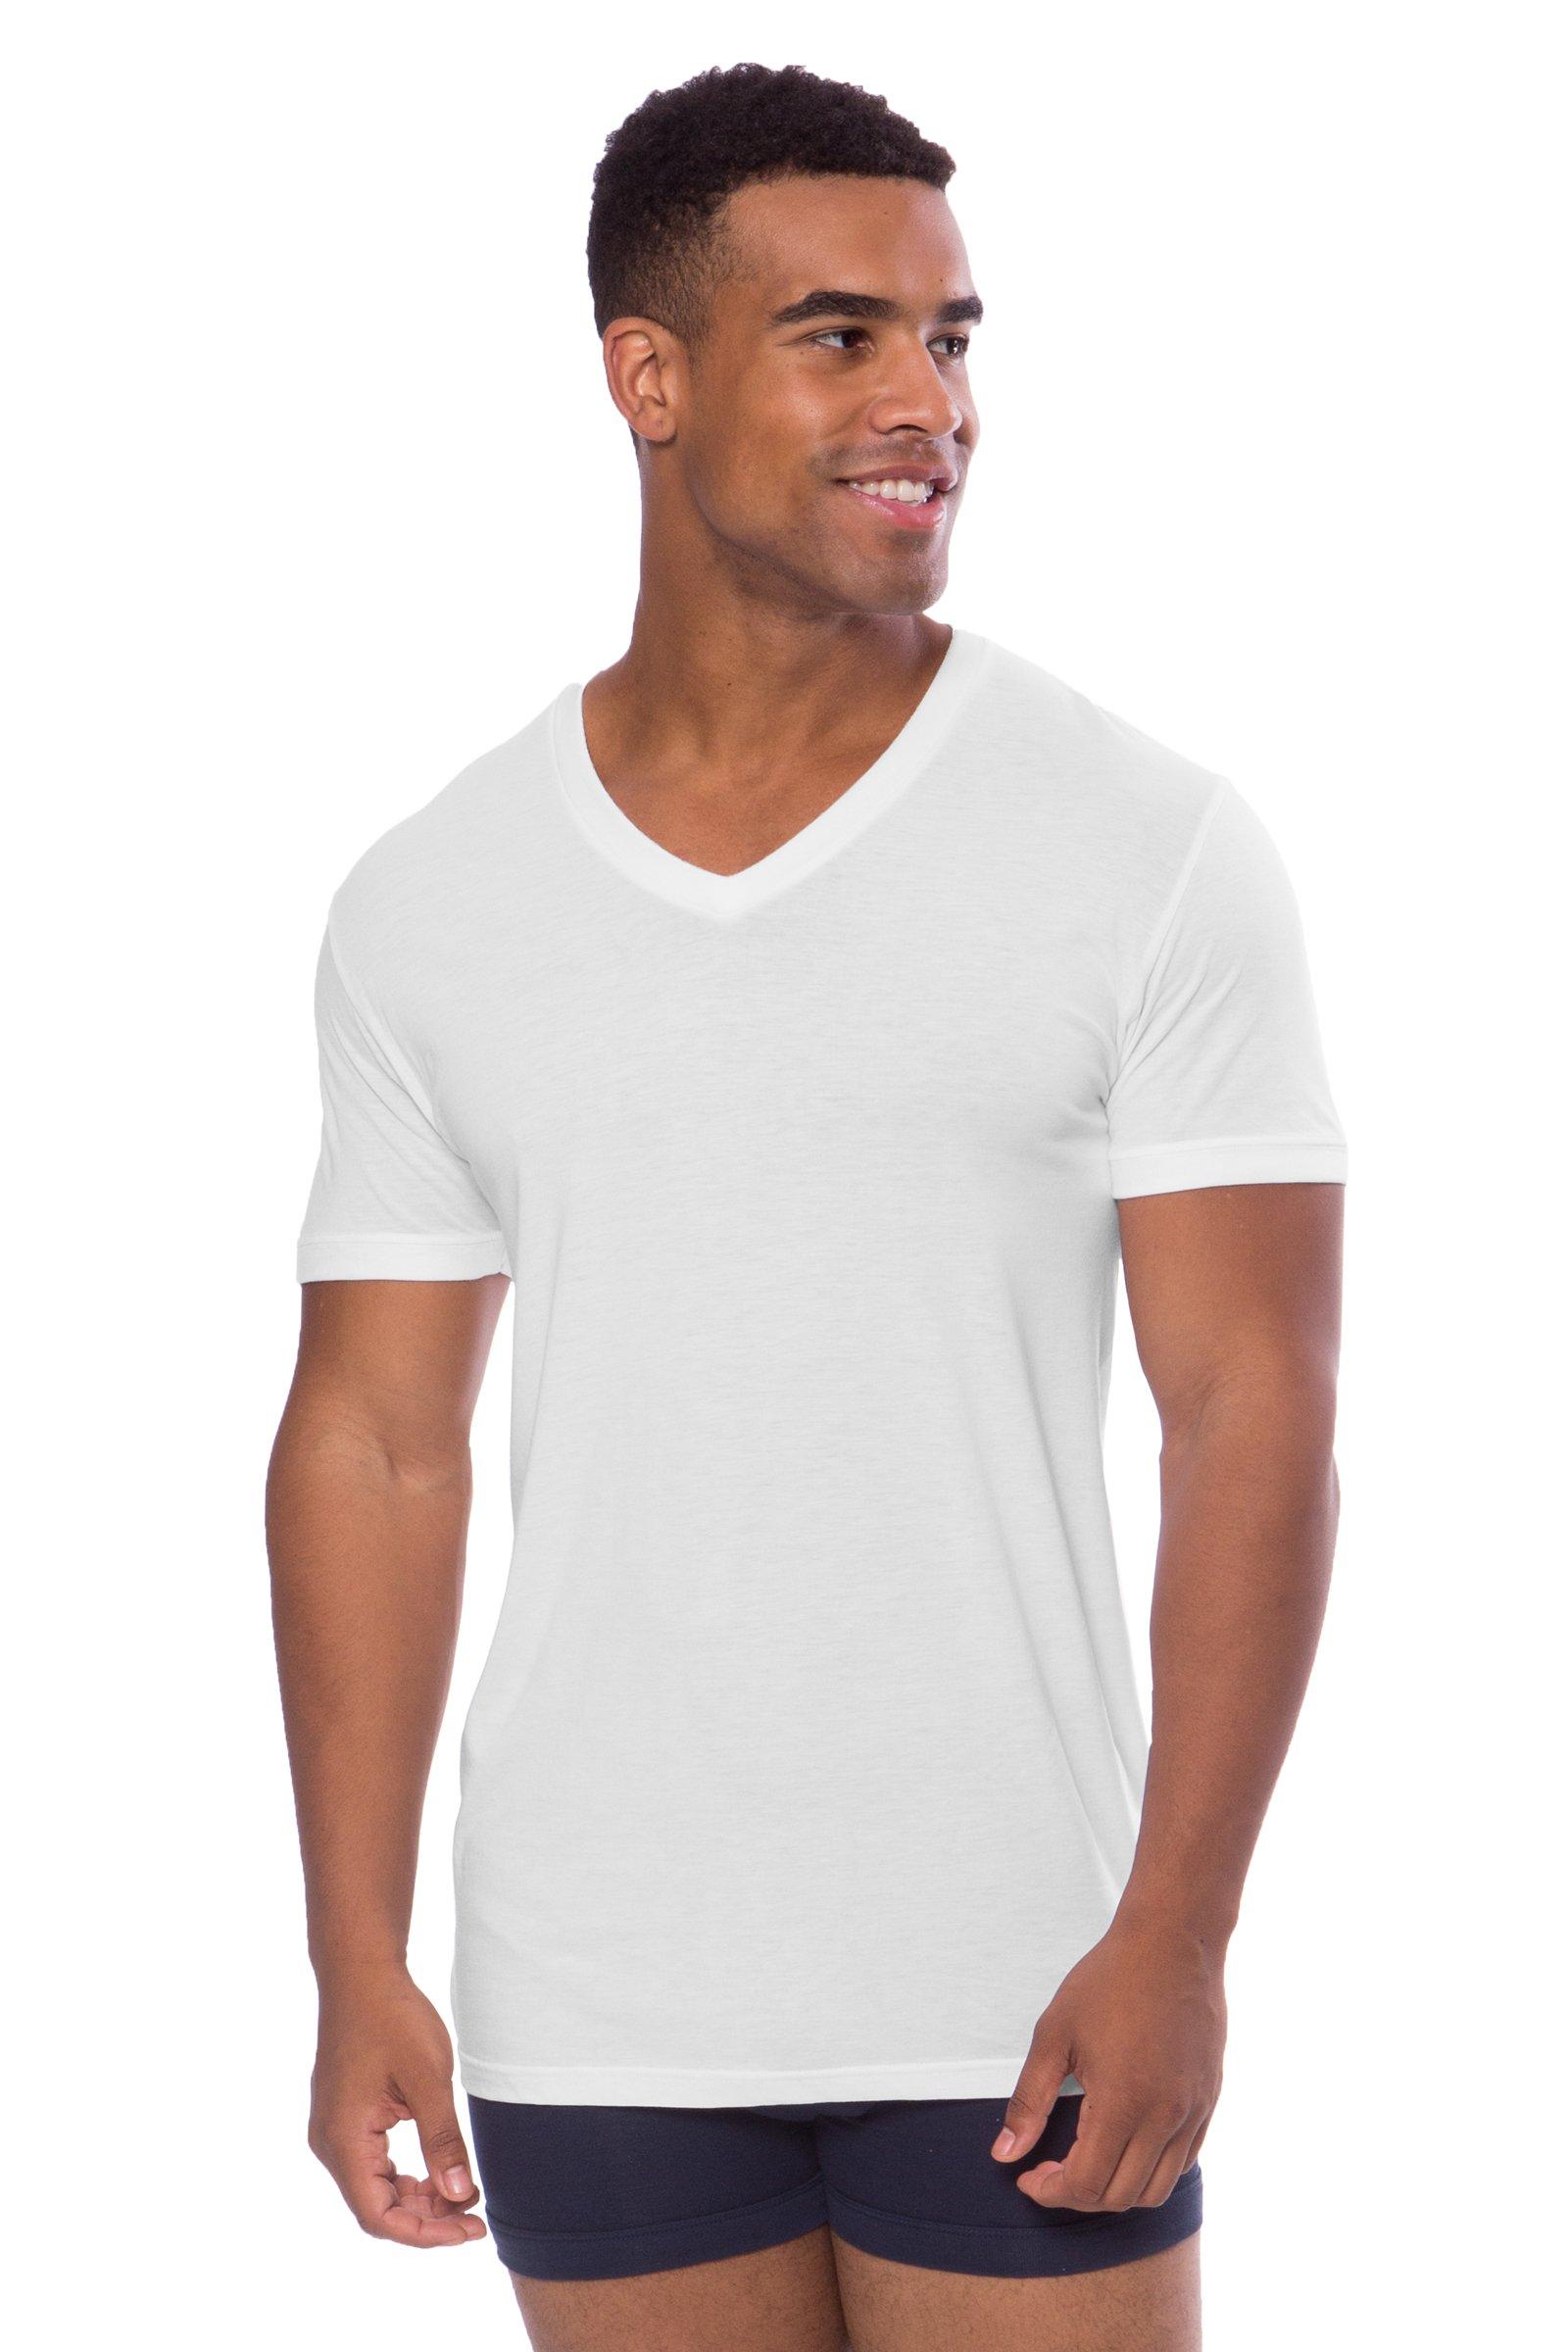 Texere Men's V-Neck Luxury Undershirt (Meio, Natural White, MT) Popular Gifts by TexereSilk